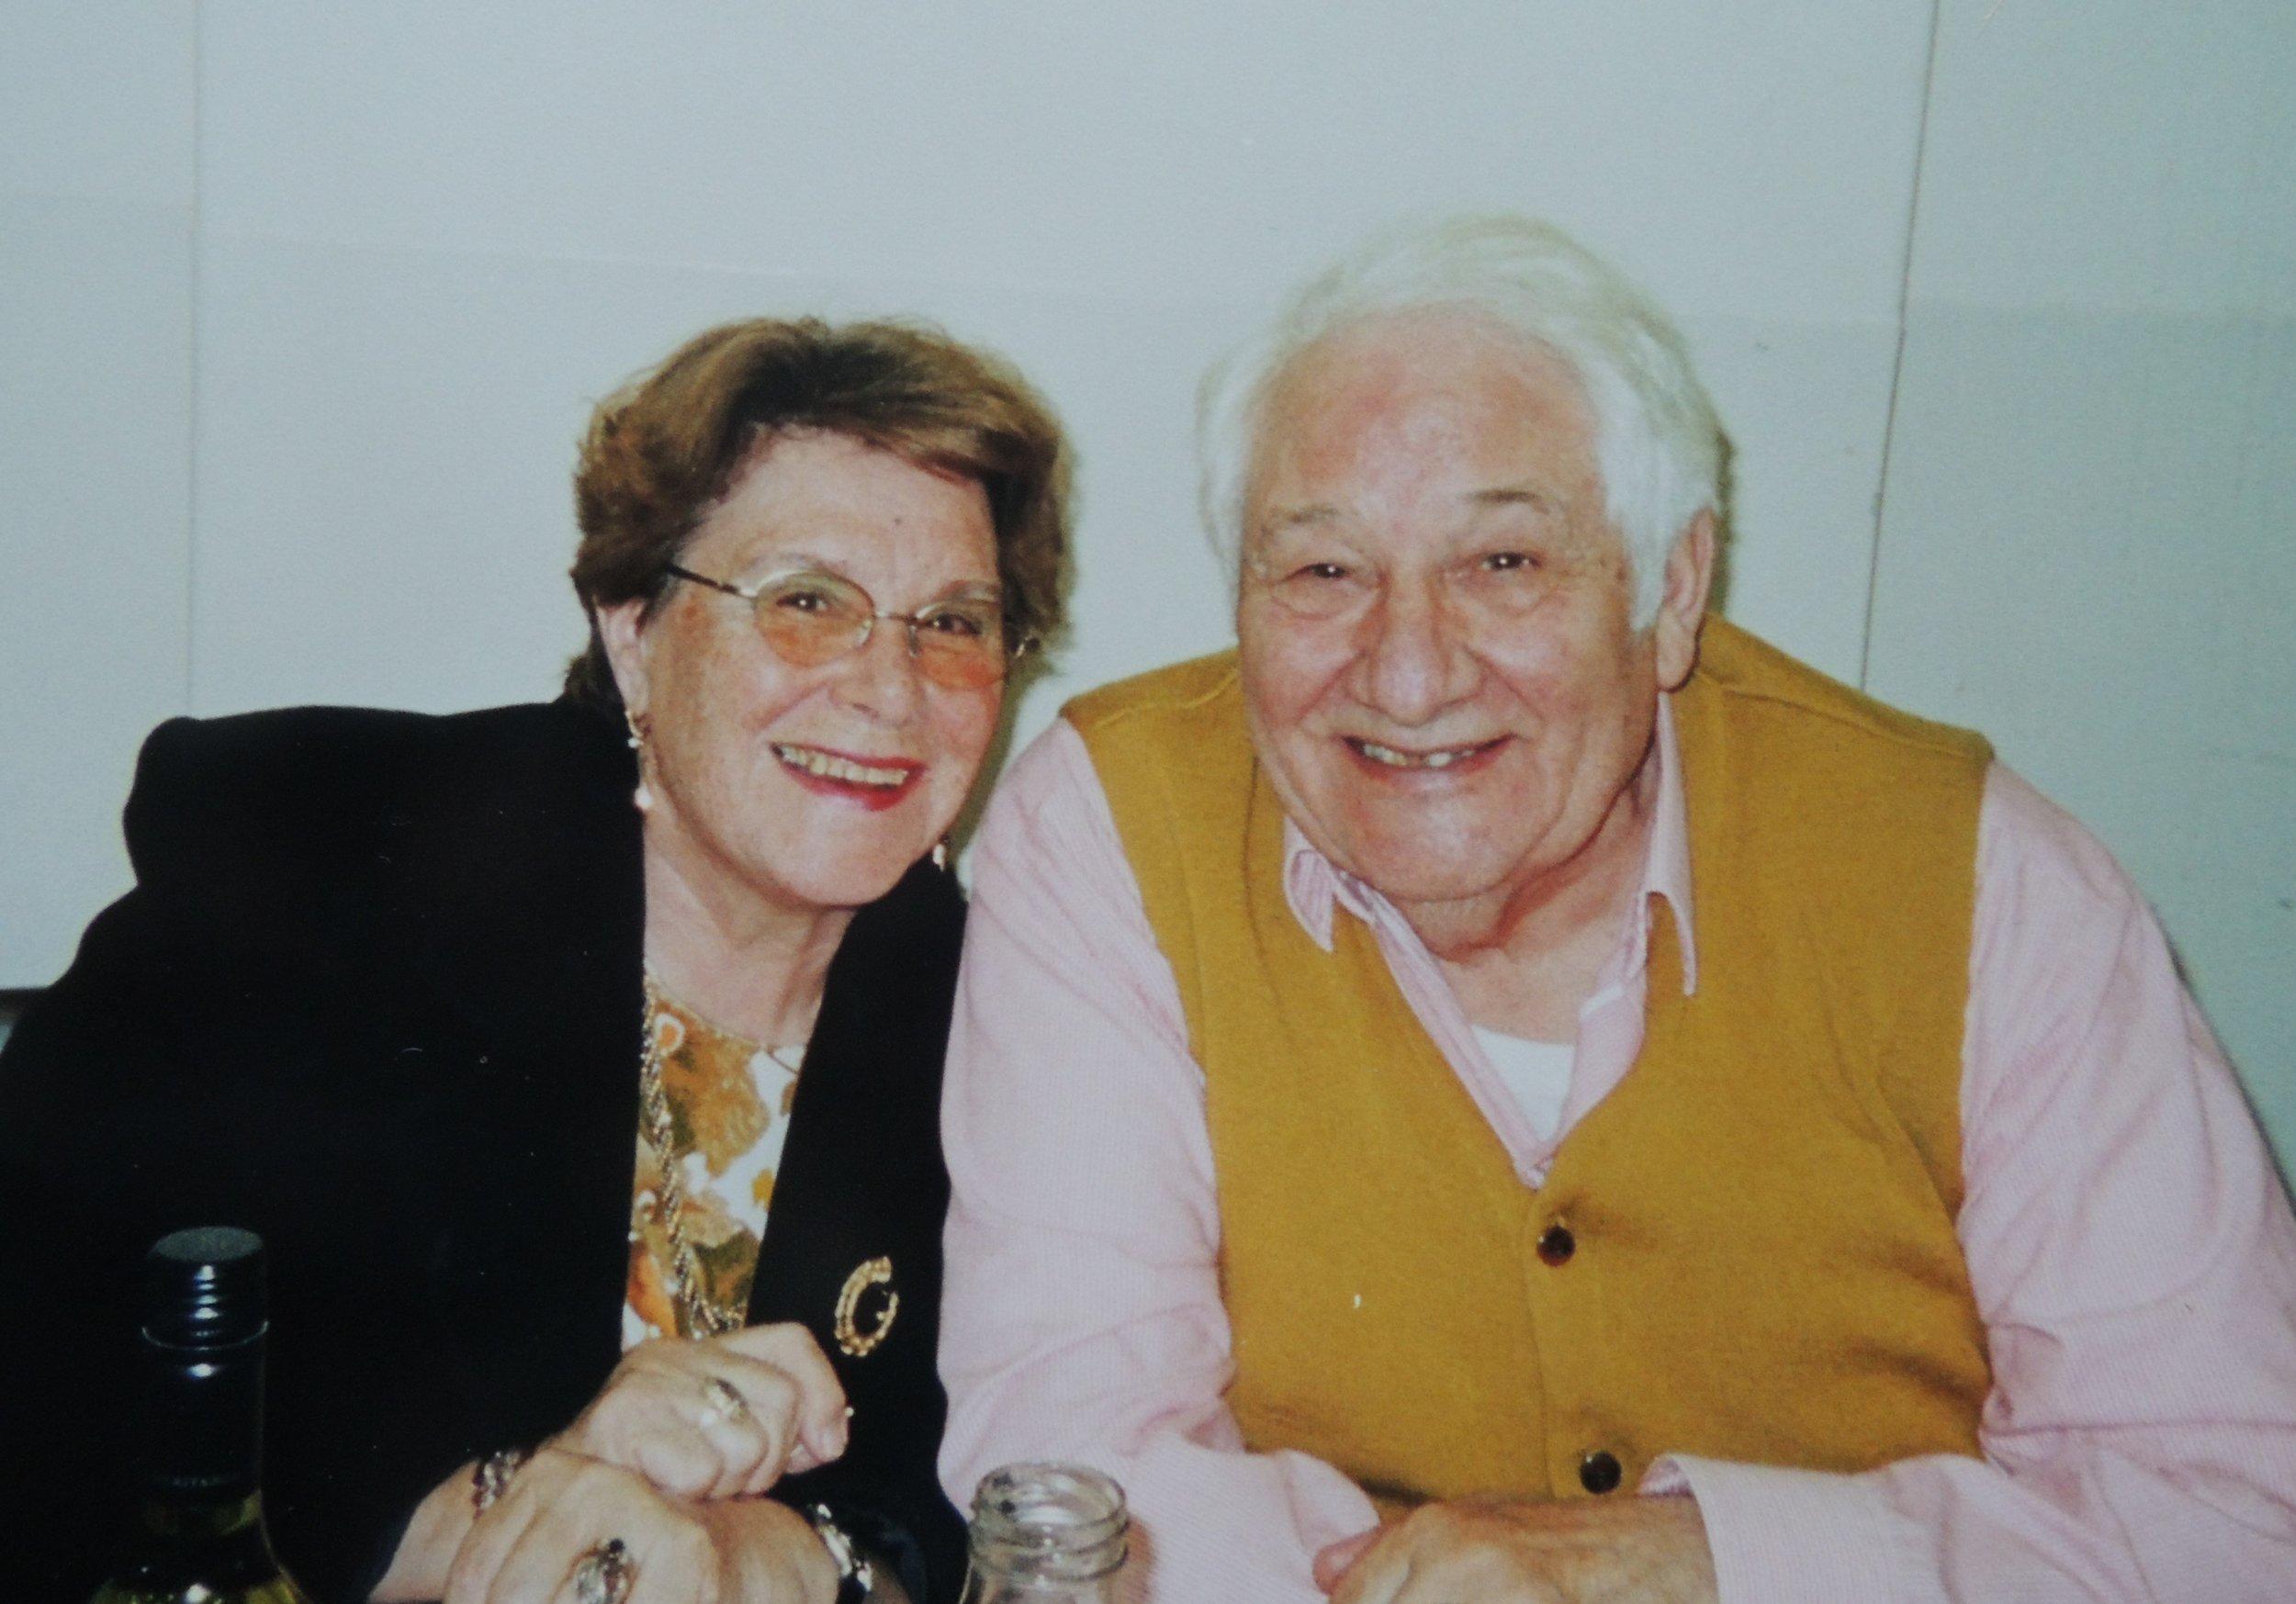 Juanita and her husband Franco